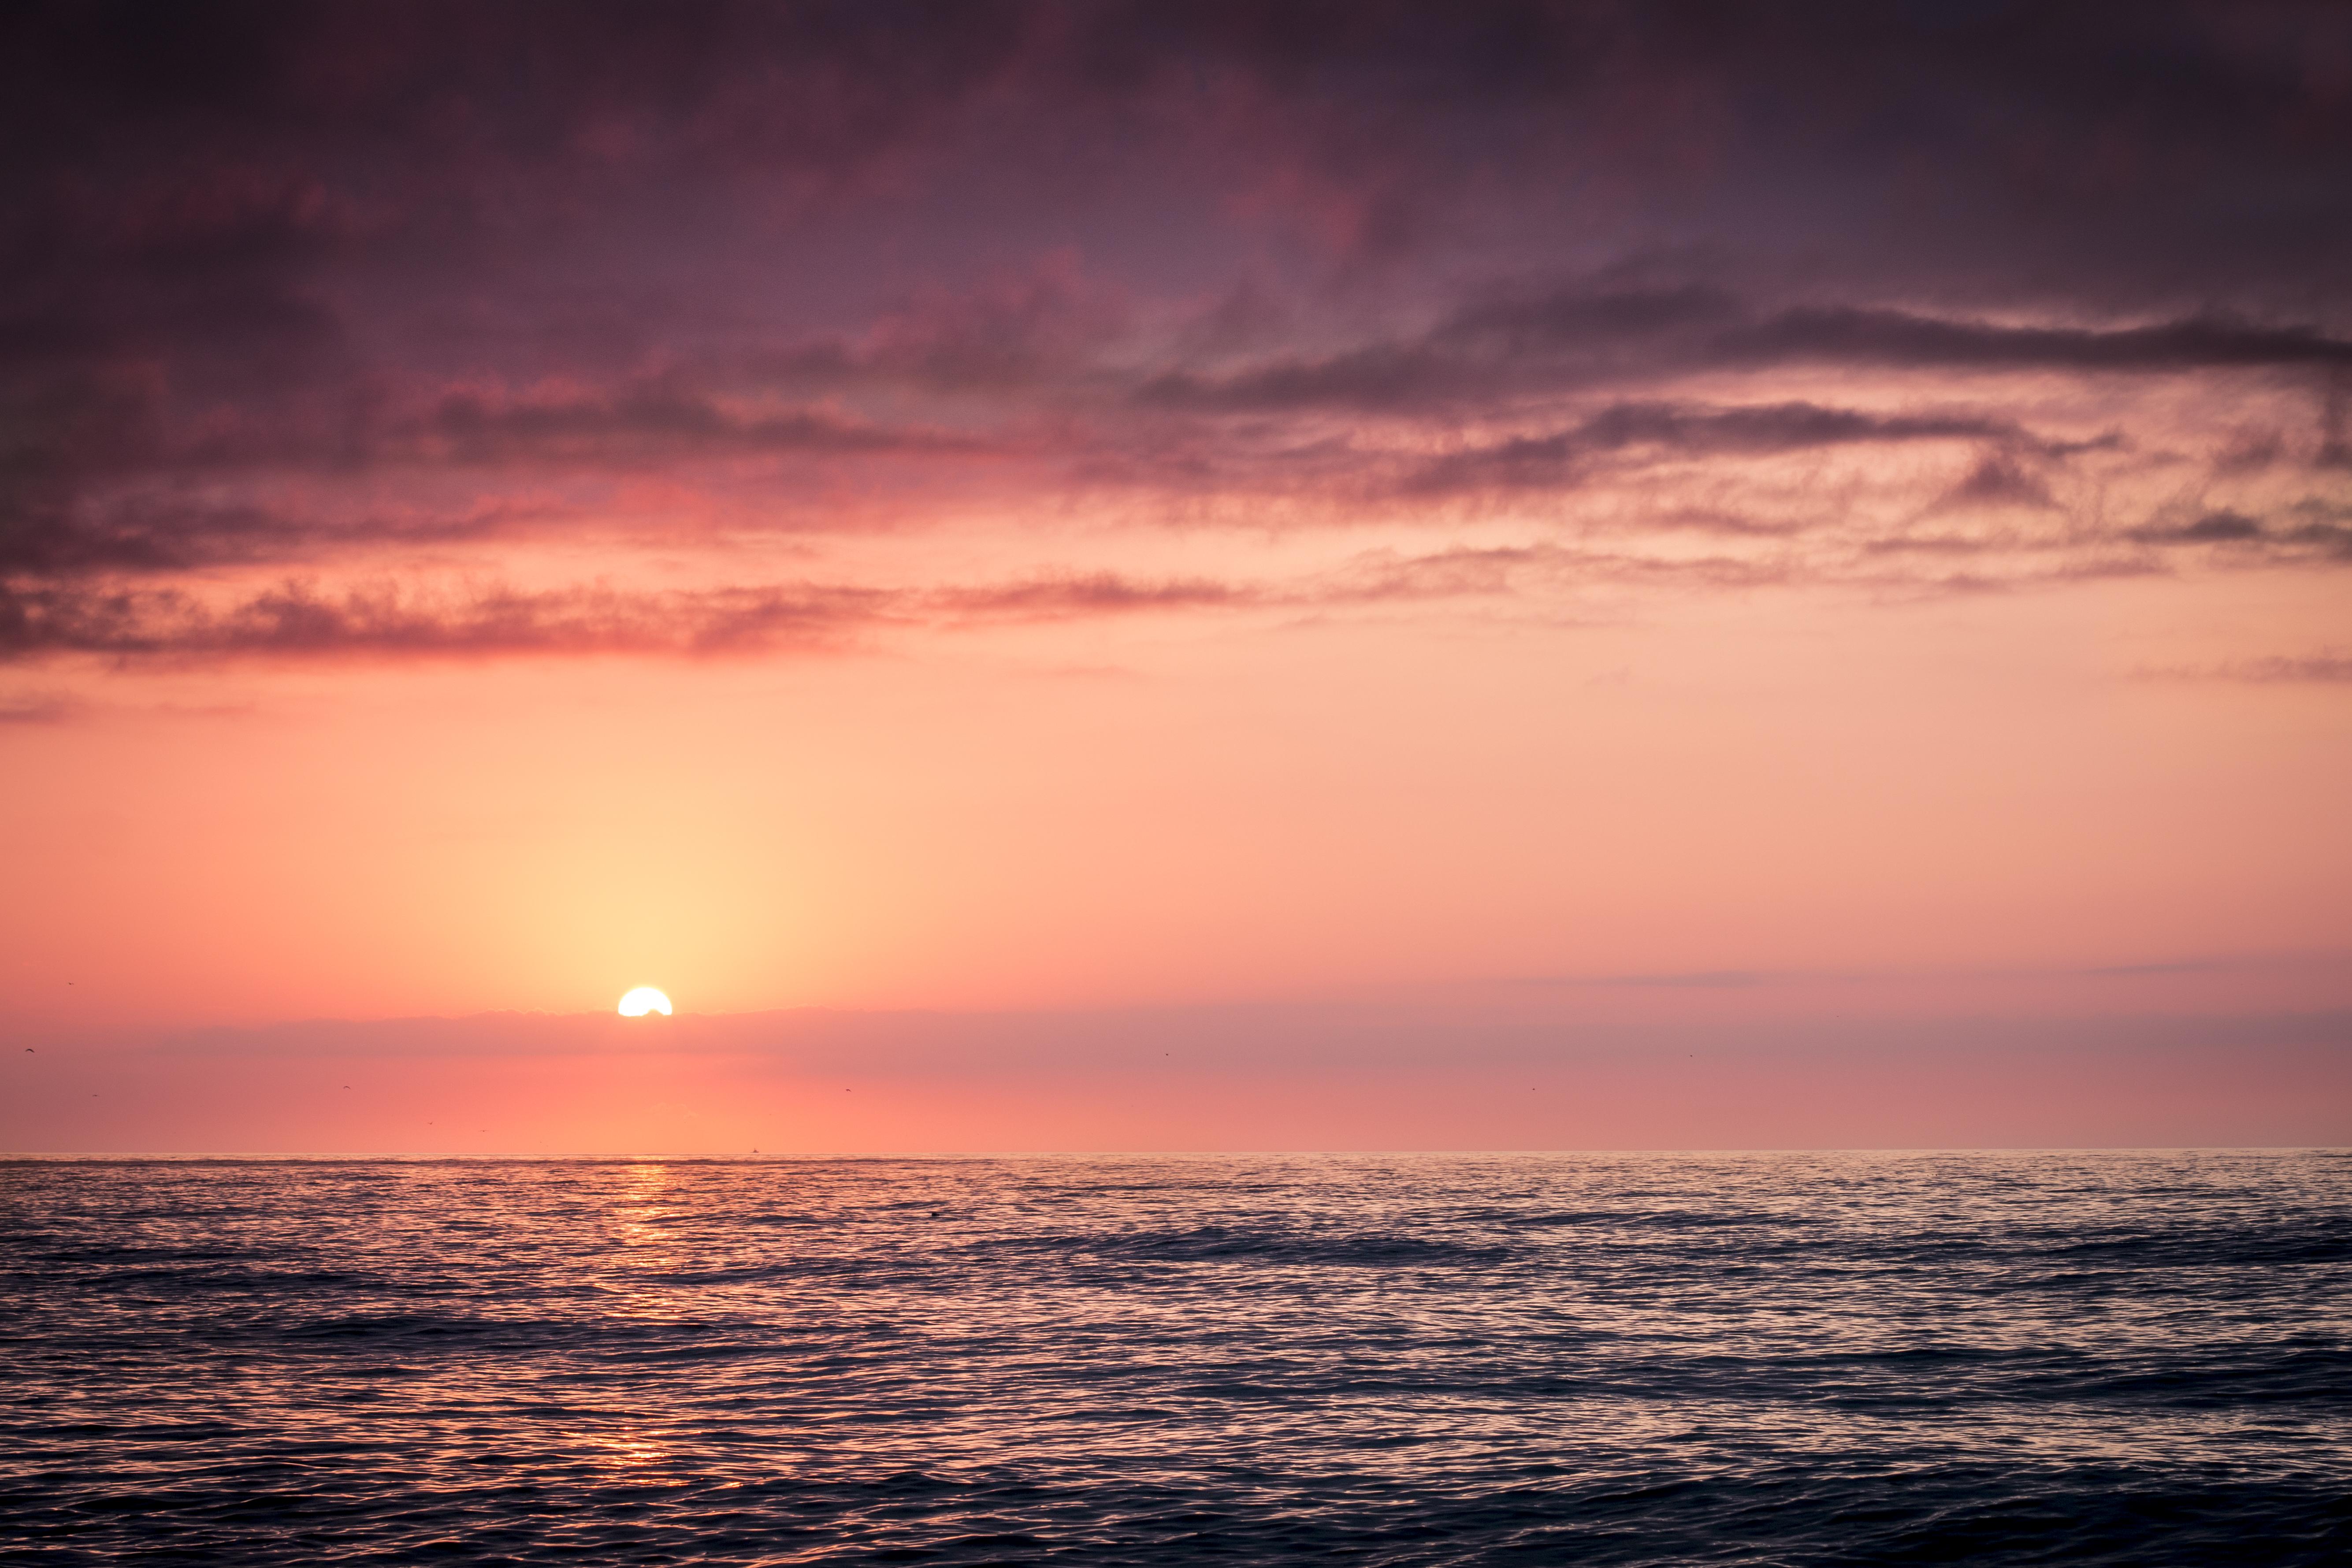 sunset ocean nature water sun horizon sunrise sea beach sky sunlight dusk morning evening dawn seawater domain cloud wave afterglow